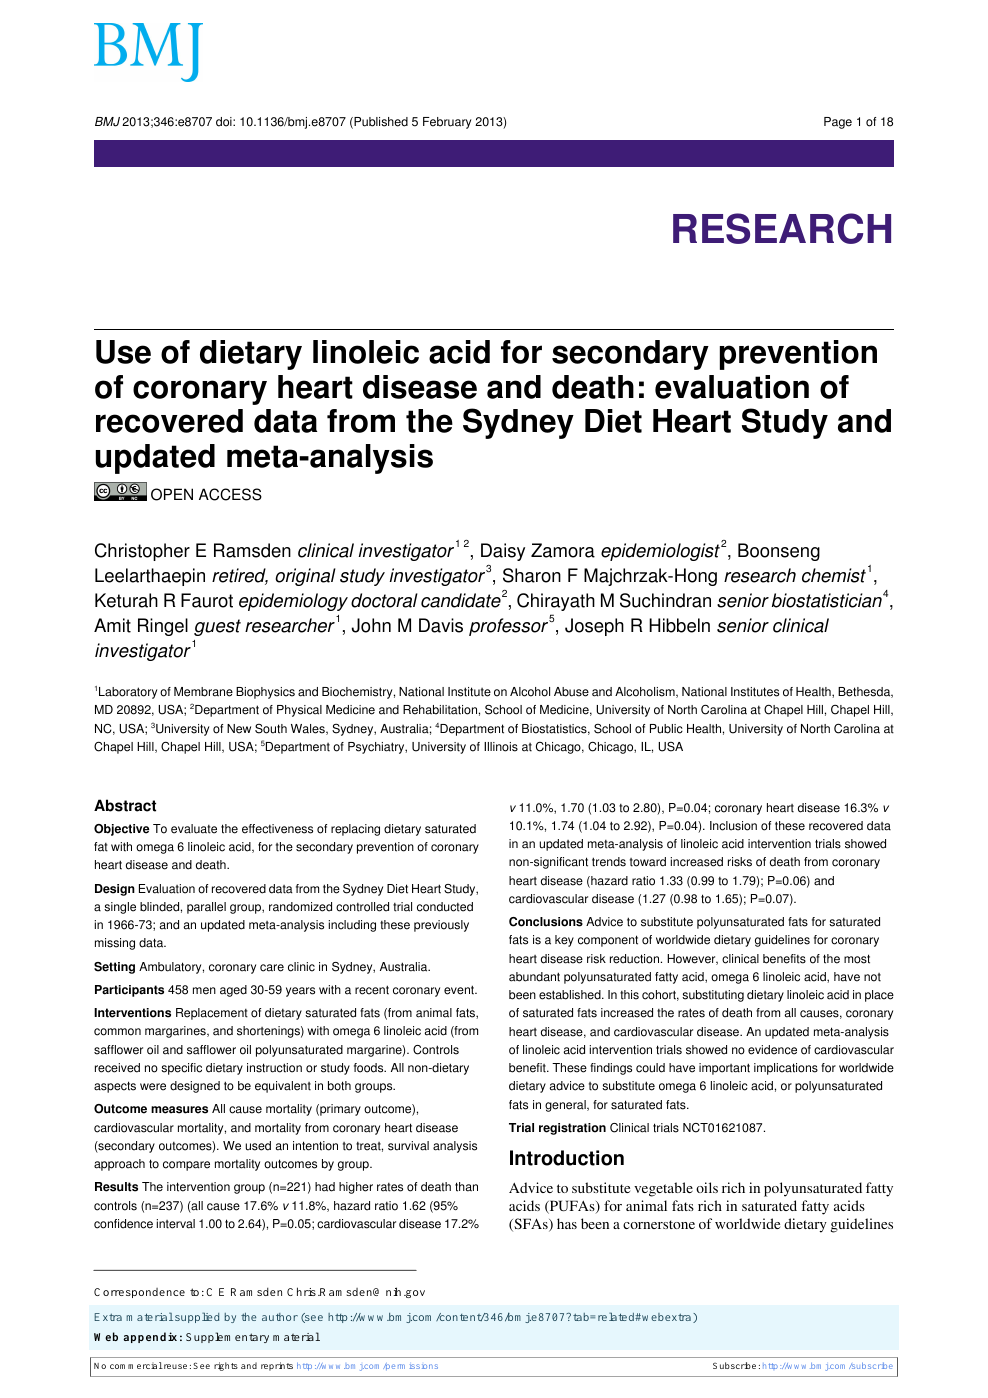 sydney diet heart study